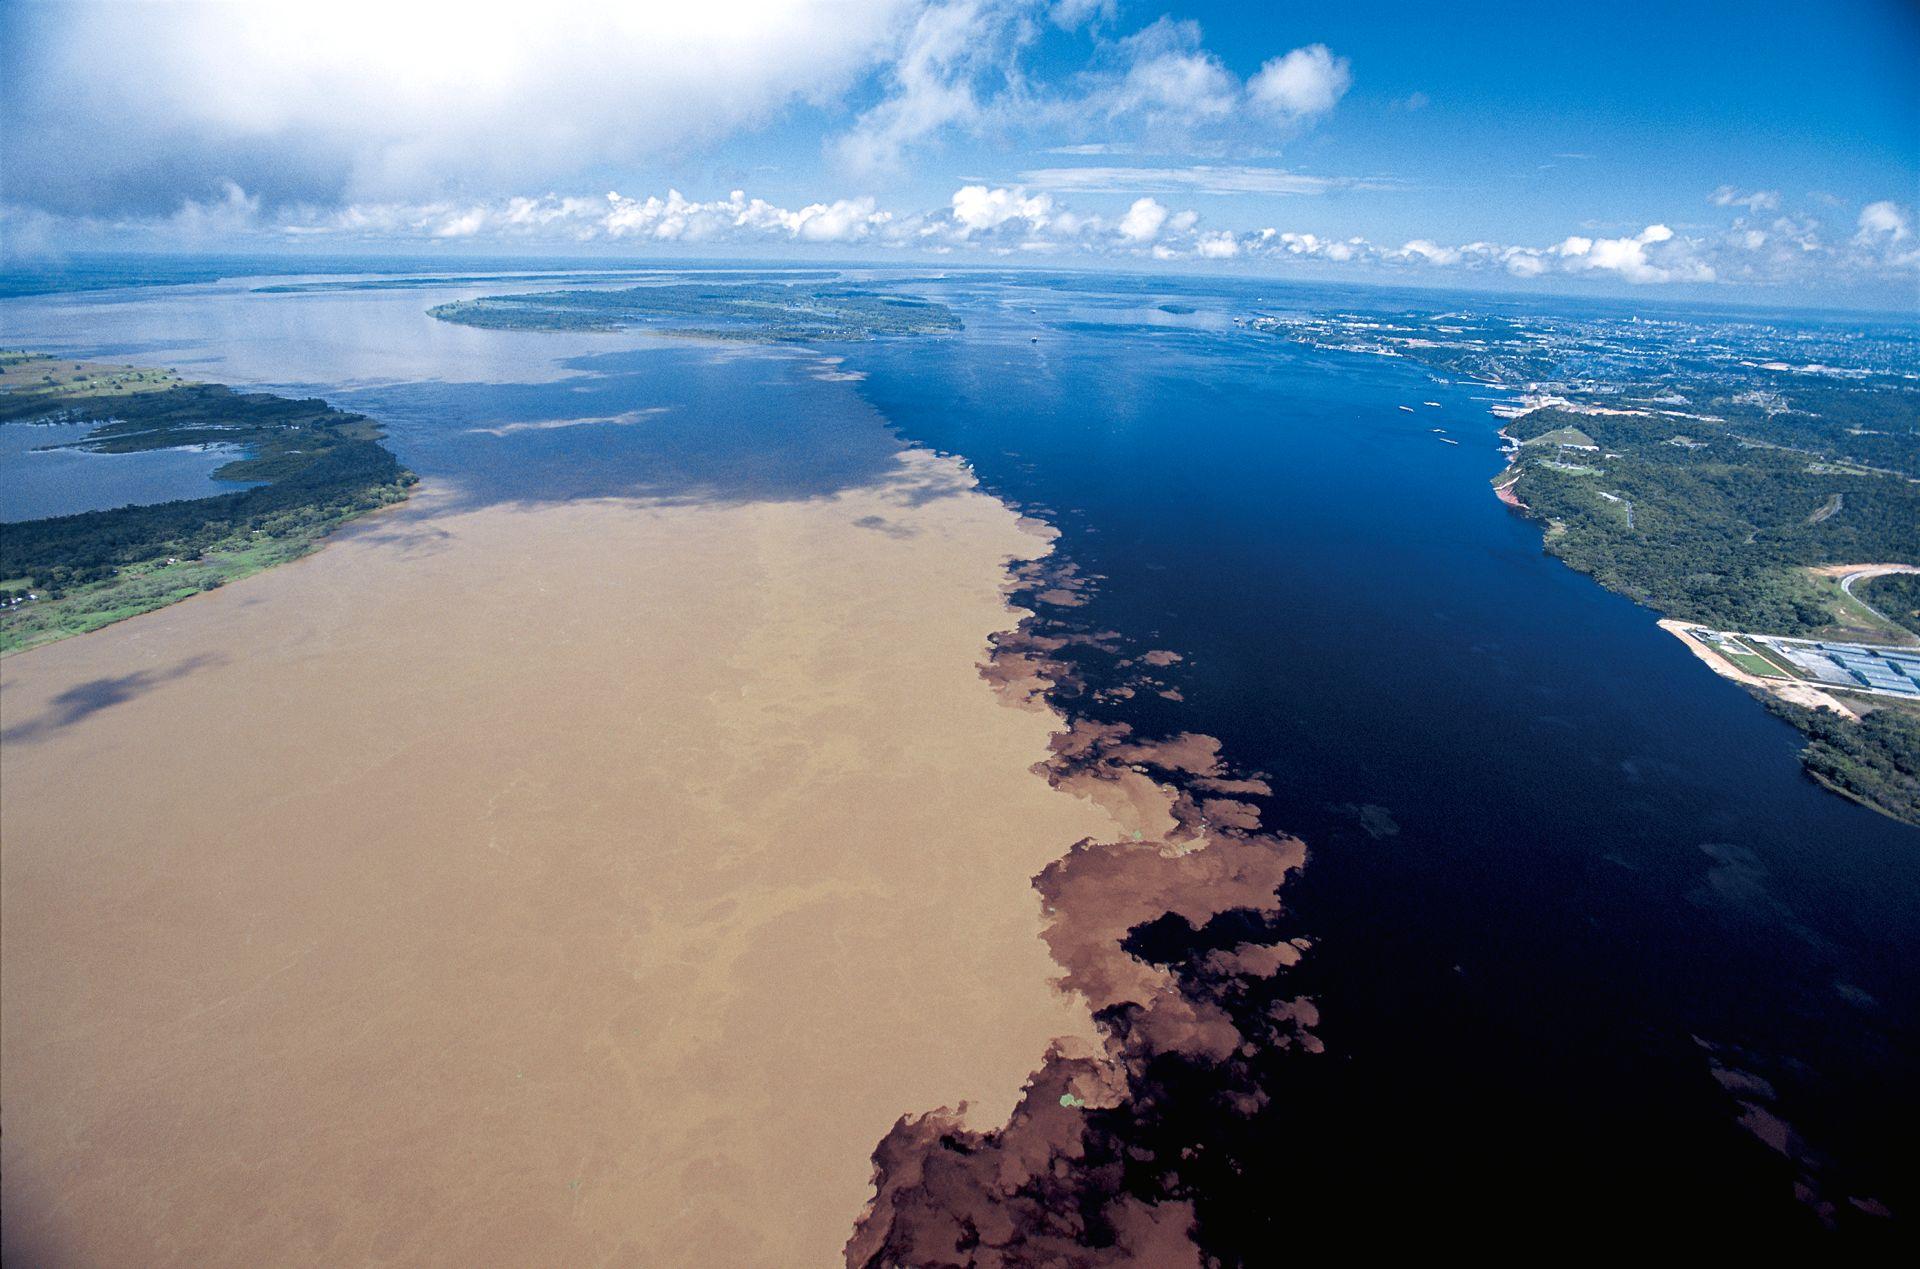 Resultado de imagem para amazon river